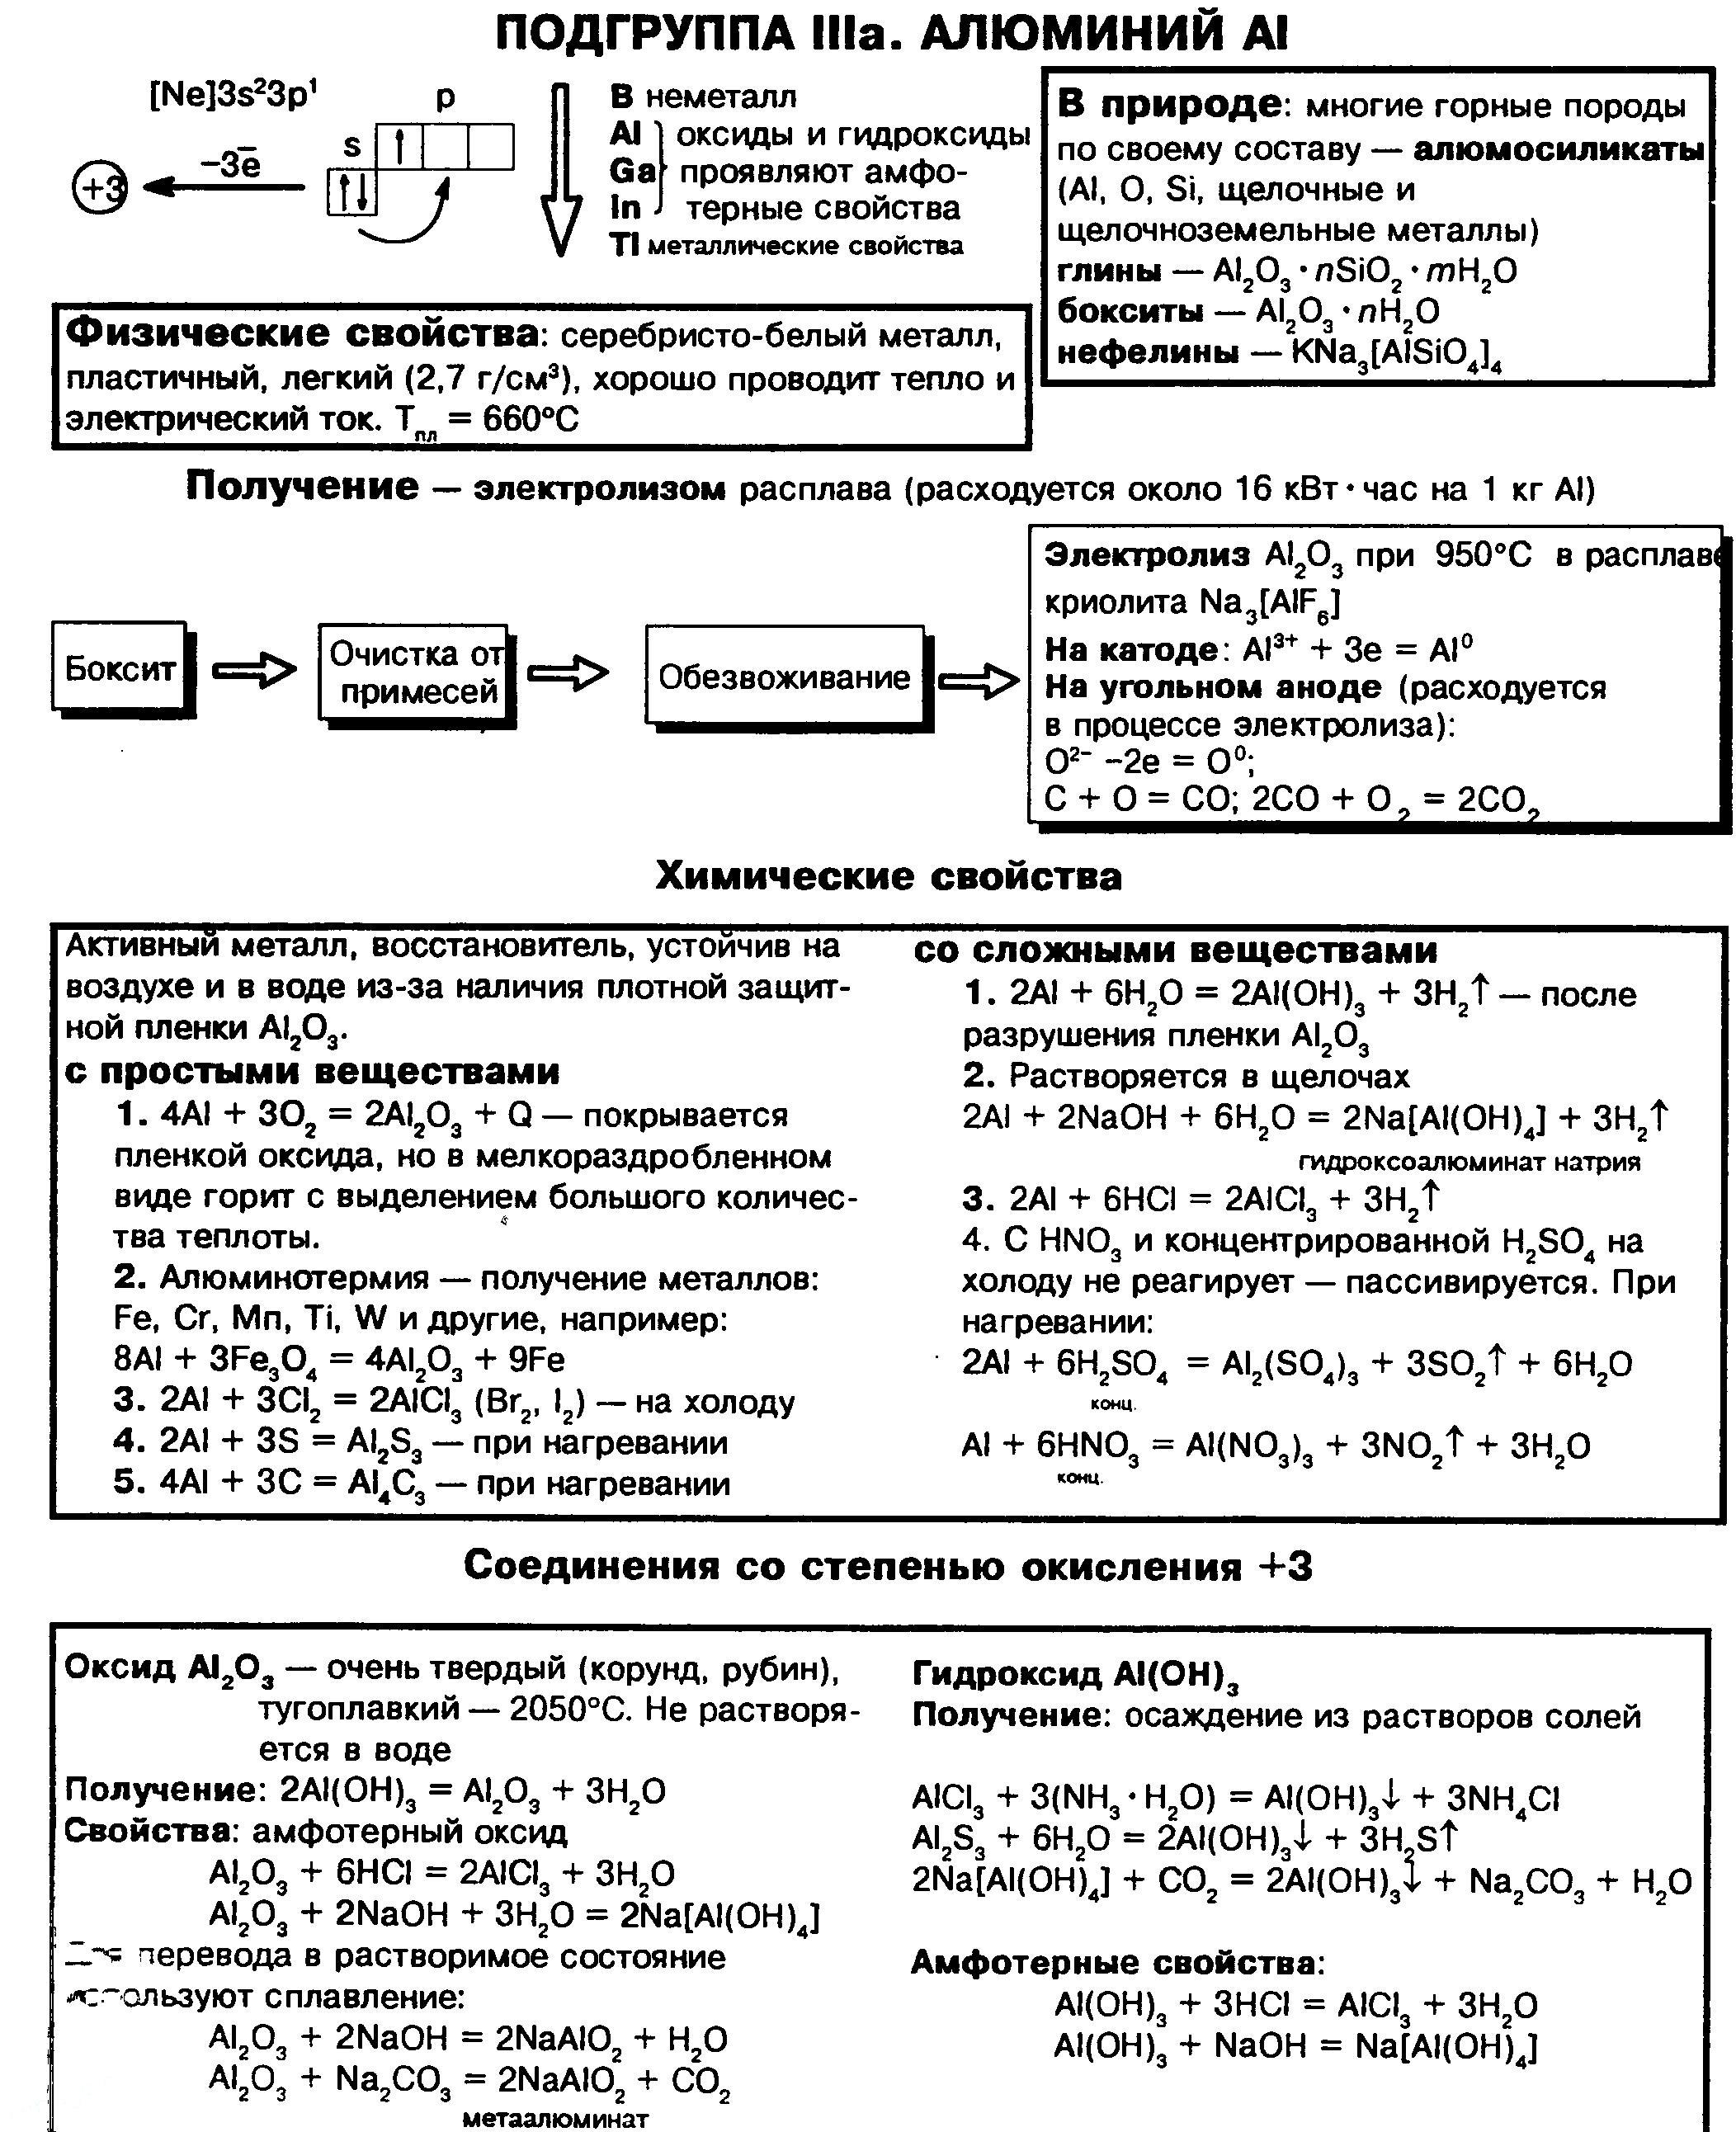 alyuminij-oksid-alyuminiya-gidroksid-alyuminiya